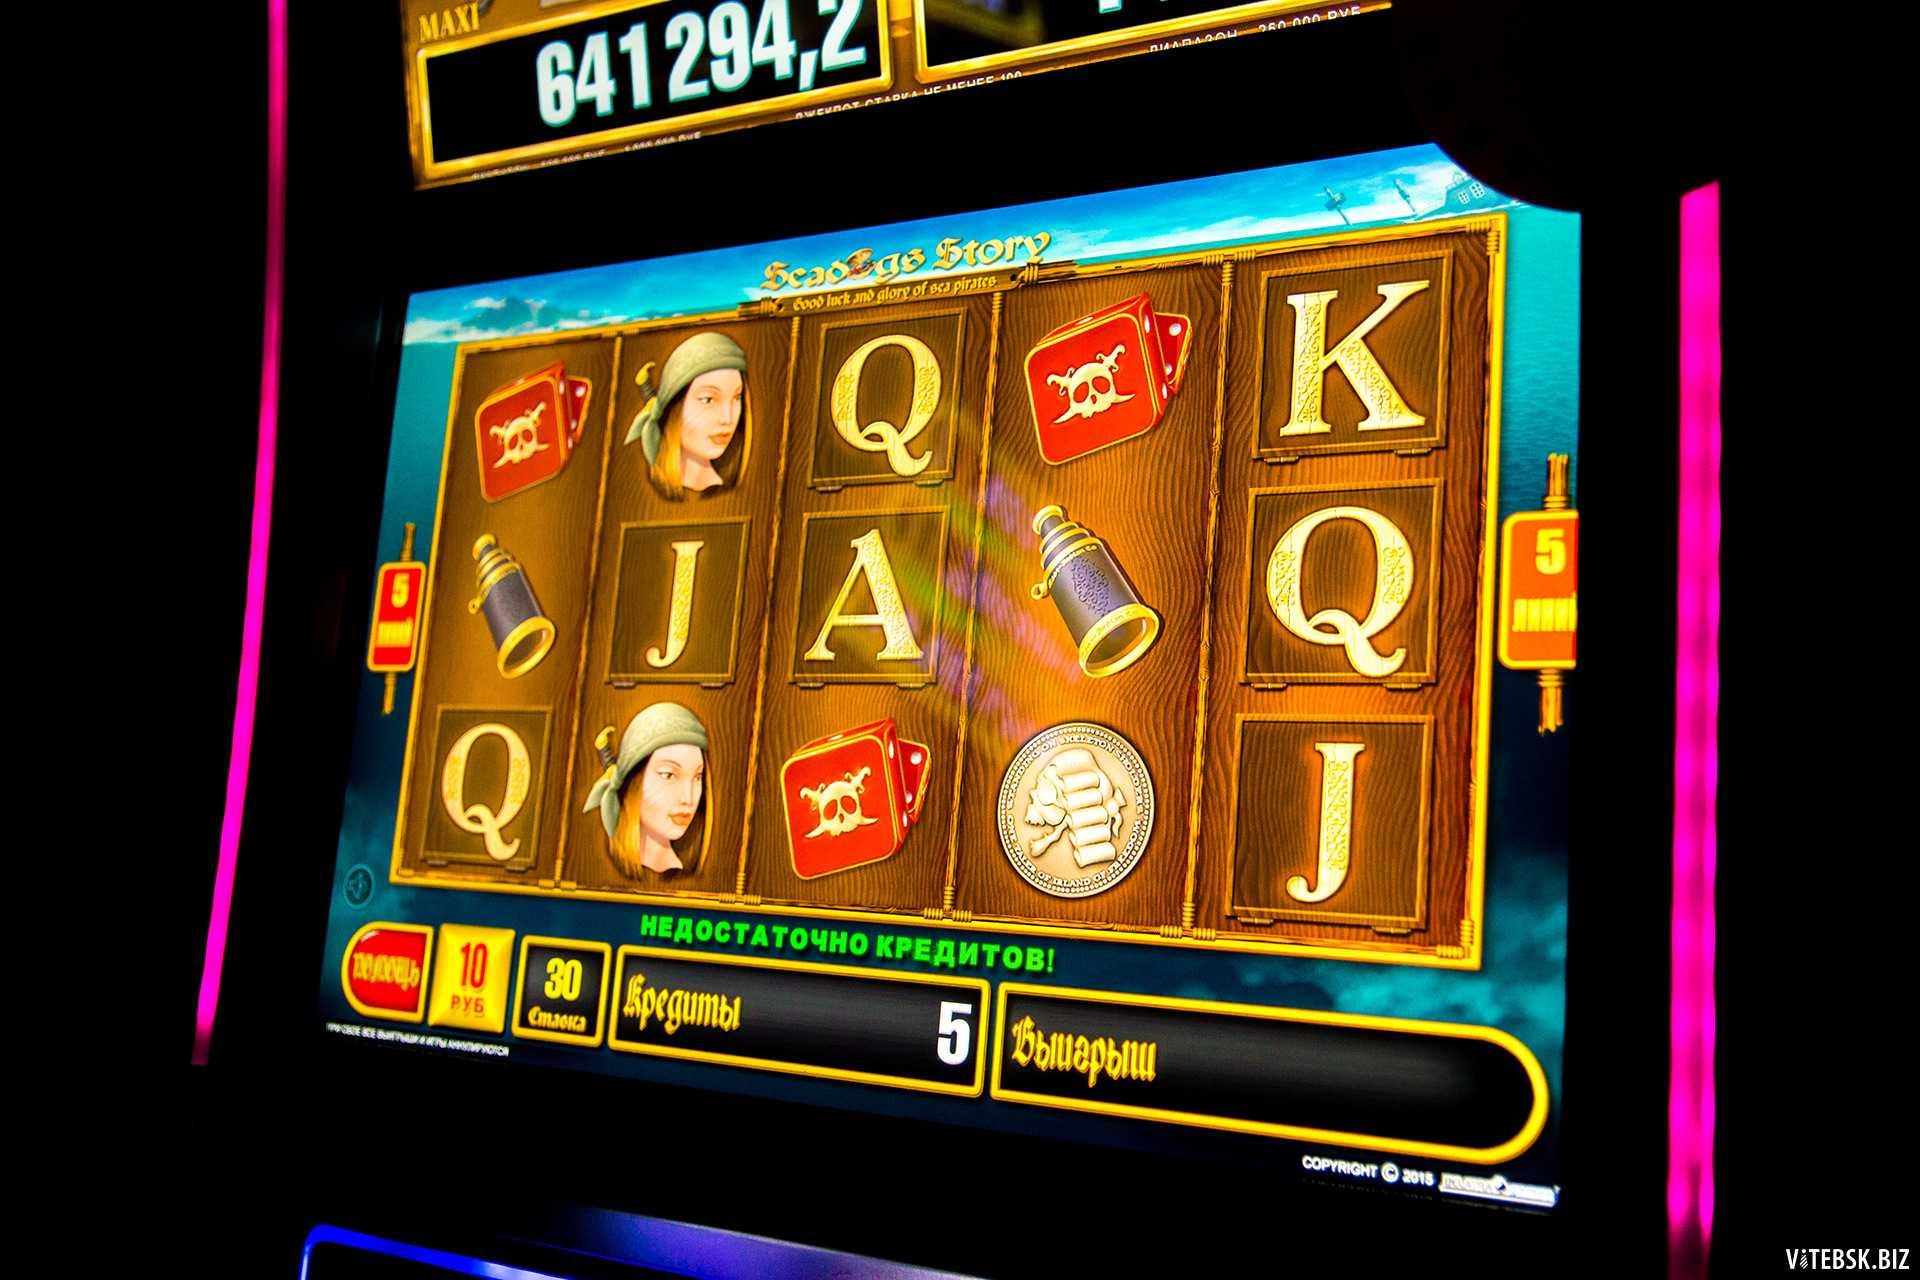 "How to win the jackpot? do i need to choose 'hot"" slots?"